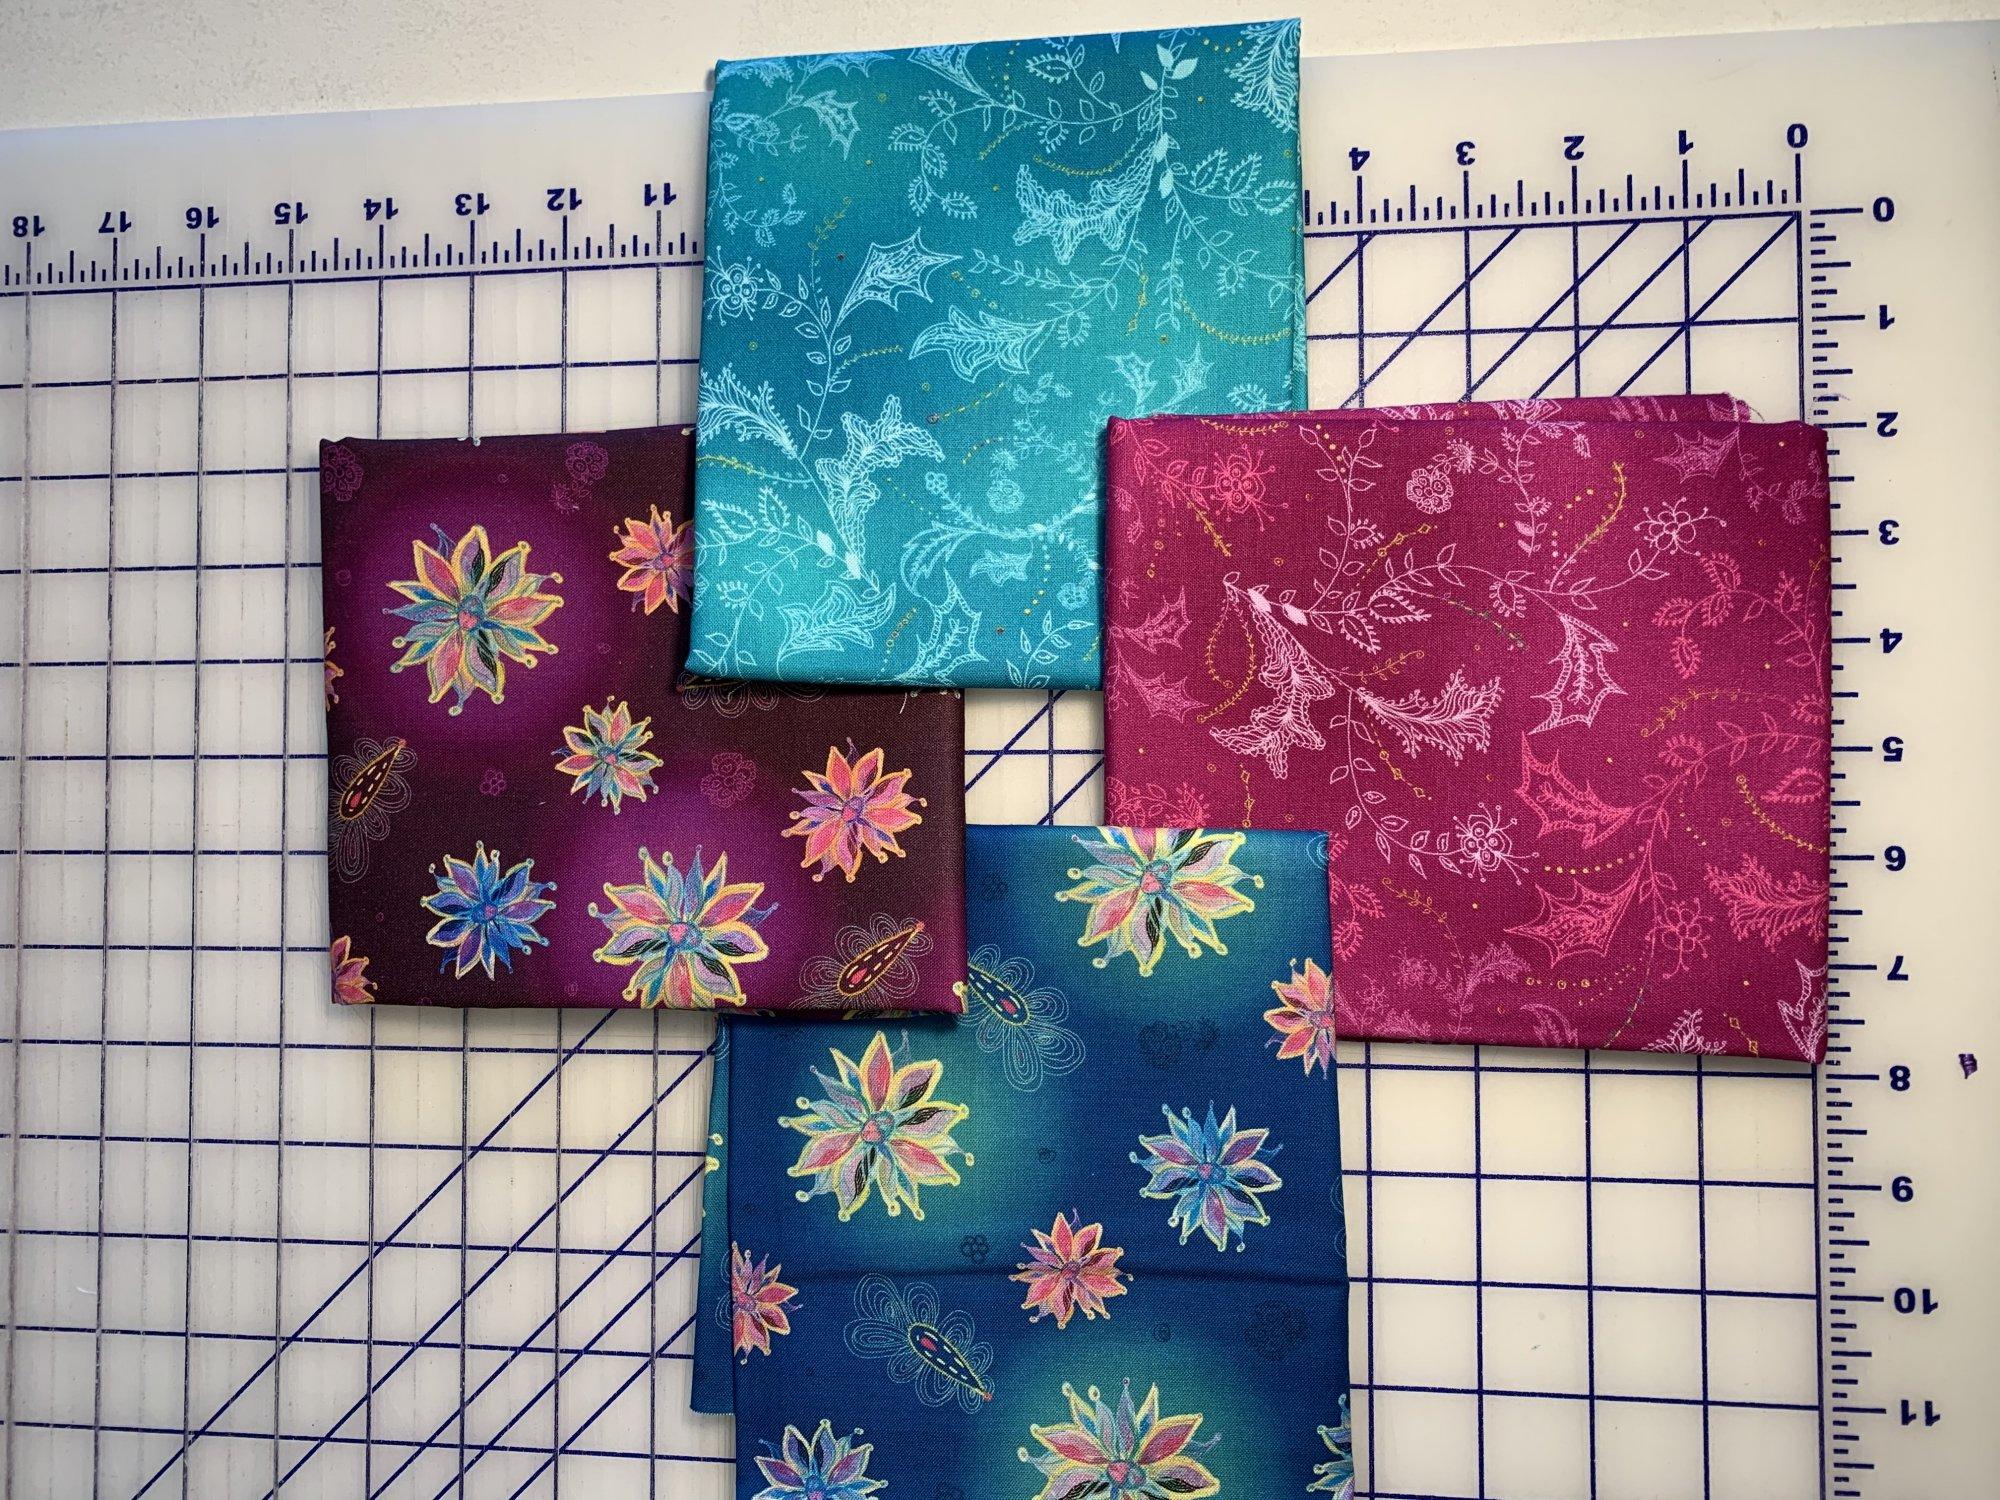 Enchanted 1/2 YD Bundle 2 yards total fabric